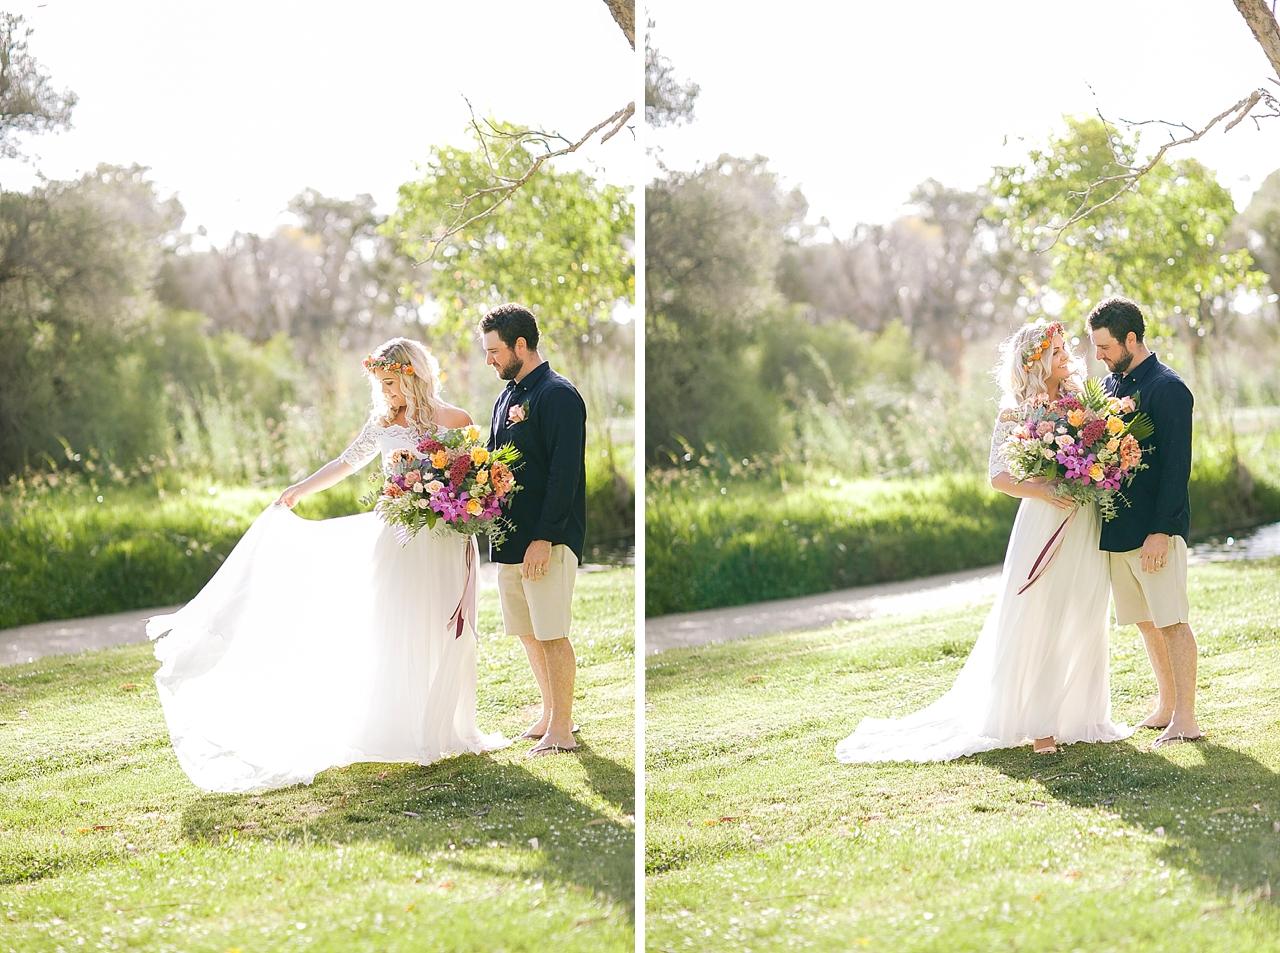 Perth Backyard Wedding0051.jpg